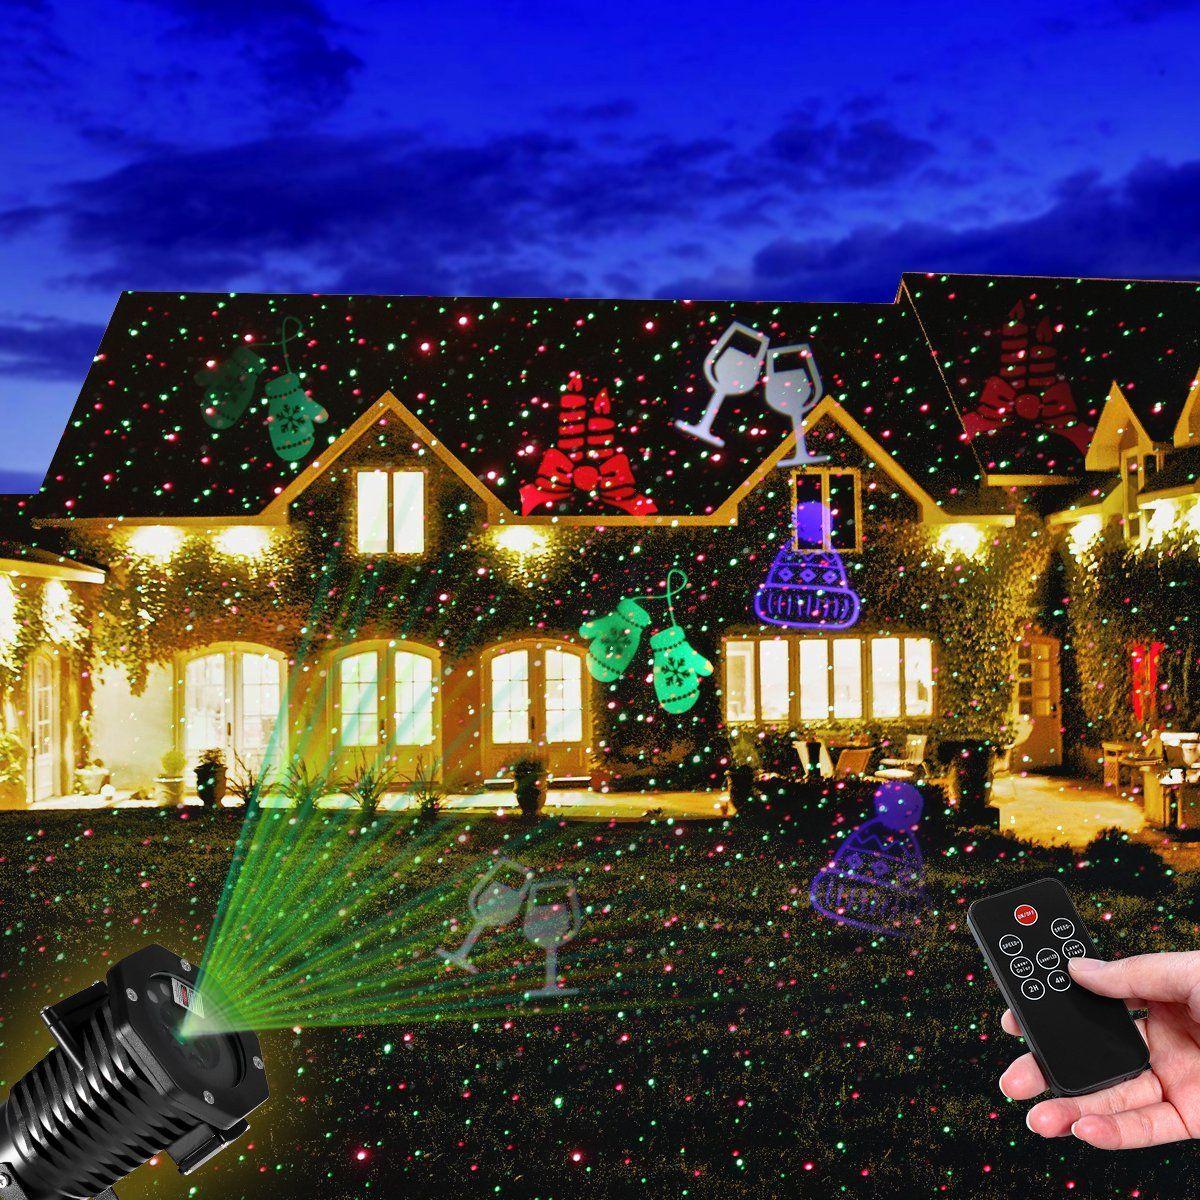 Laser Light Christmas Decoration Fresh Christmas Light Projector Yunlights Waterproof Outdoor In 2020 Decorating With Christmas Lights Laser Christmas Lights Amazon Christmas Decorations